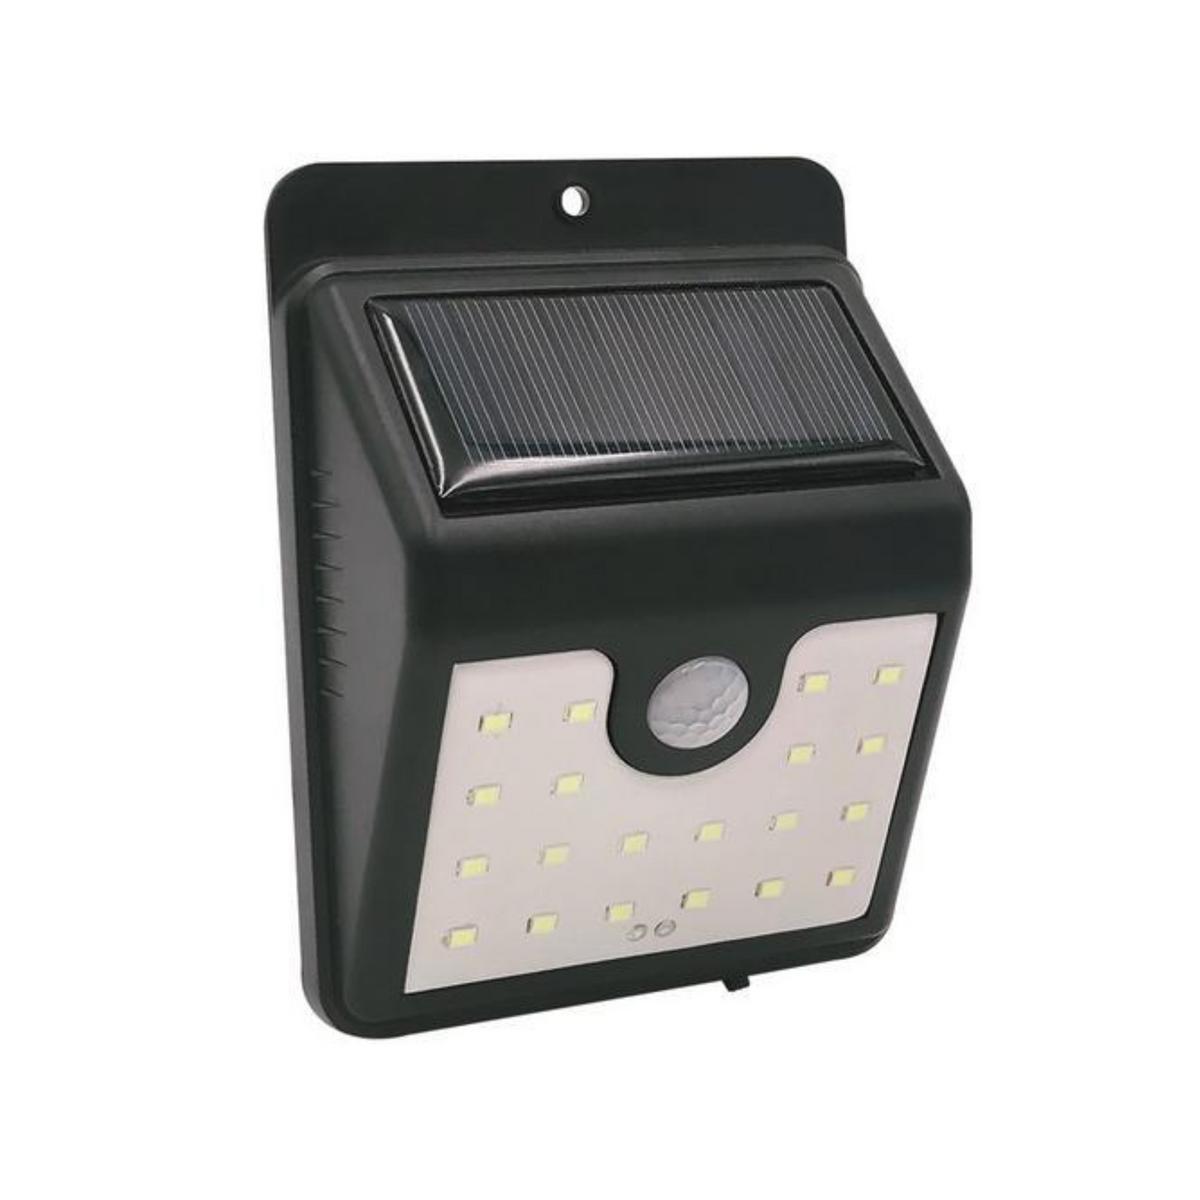 Lampa solárna so senzorom